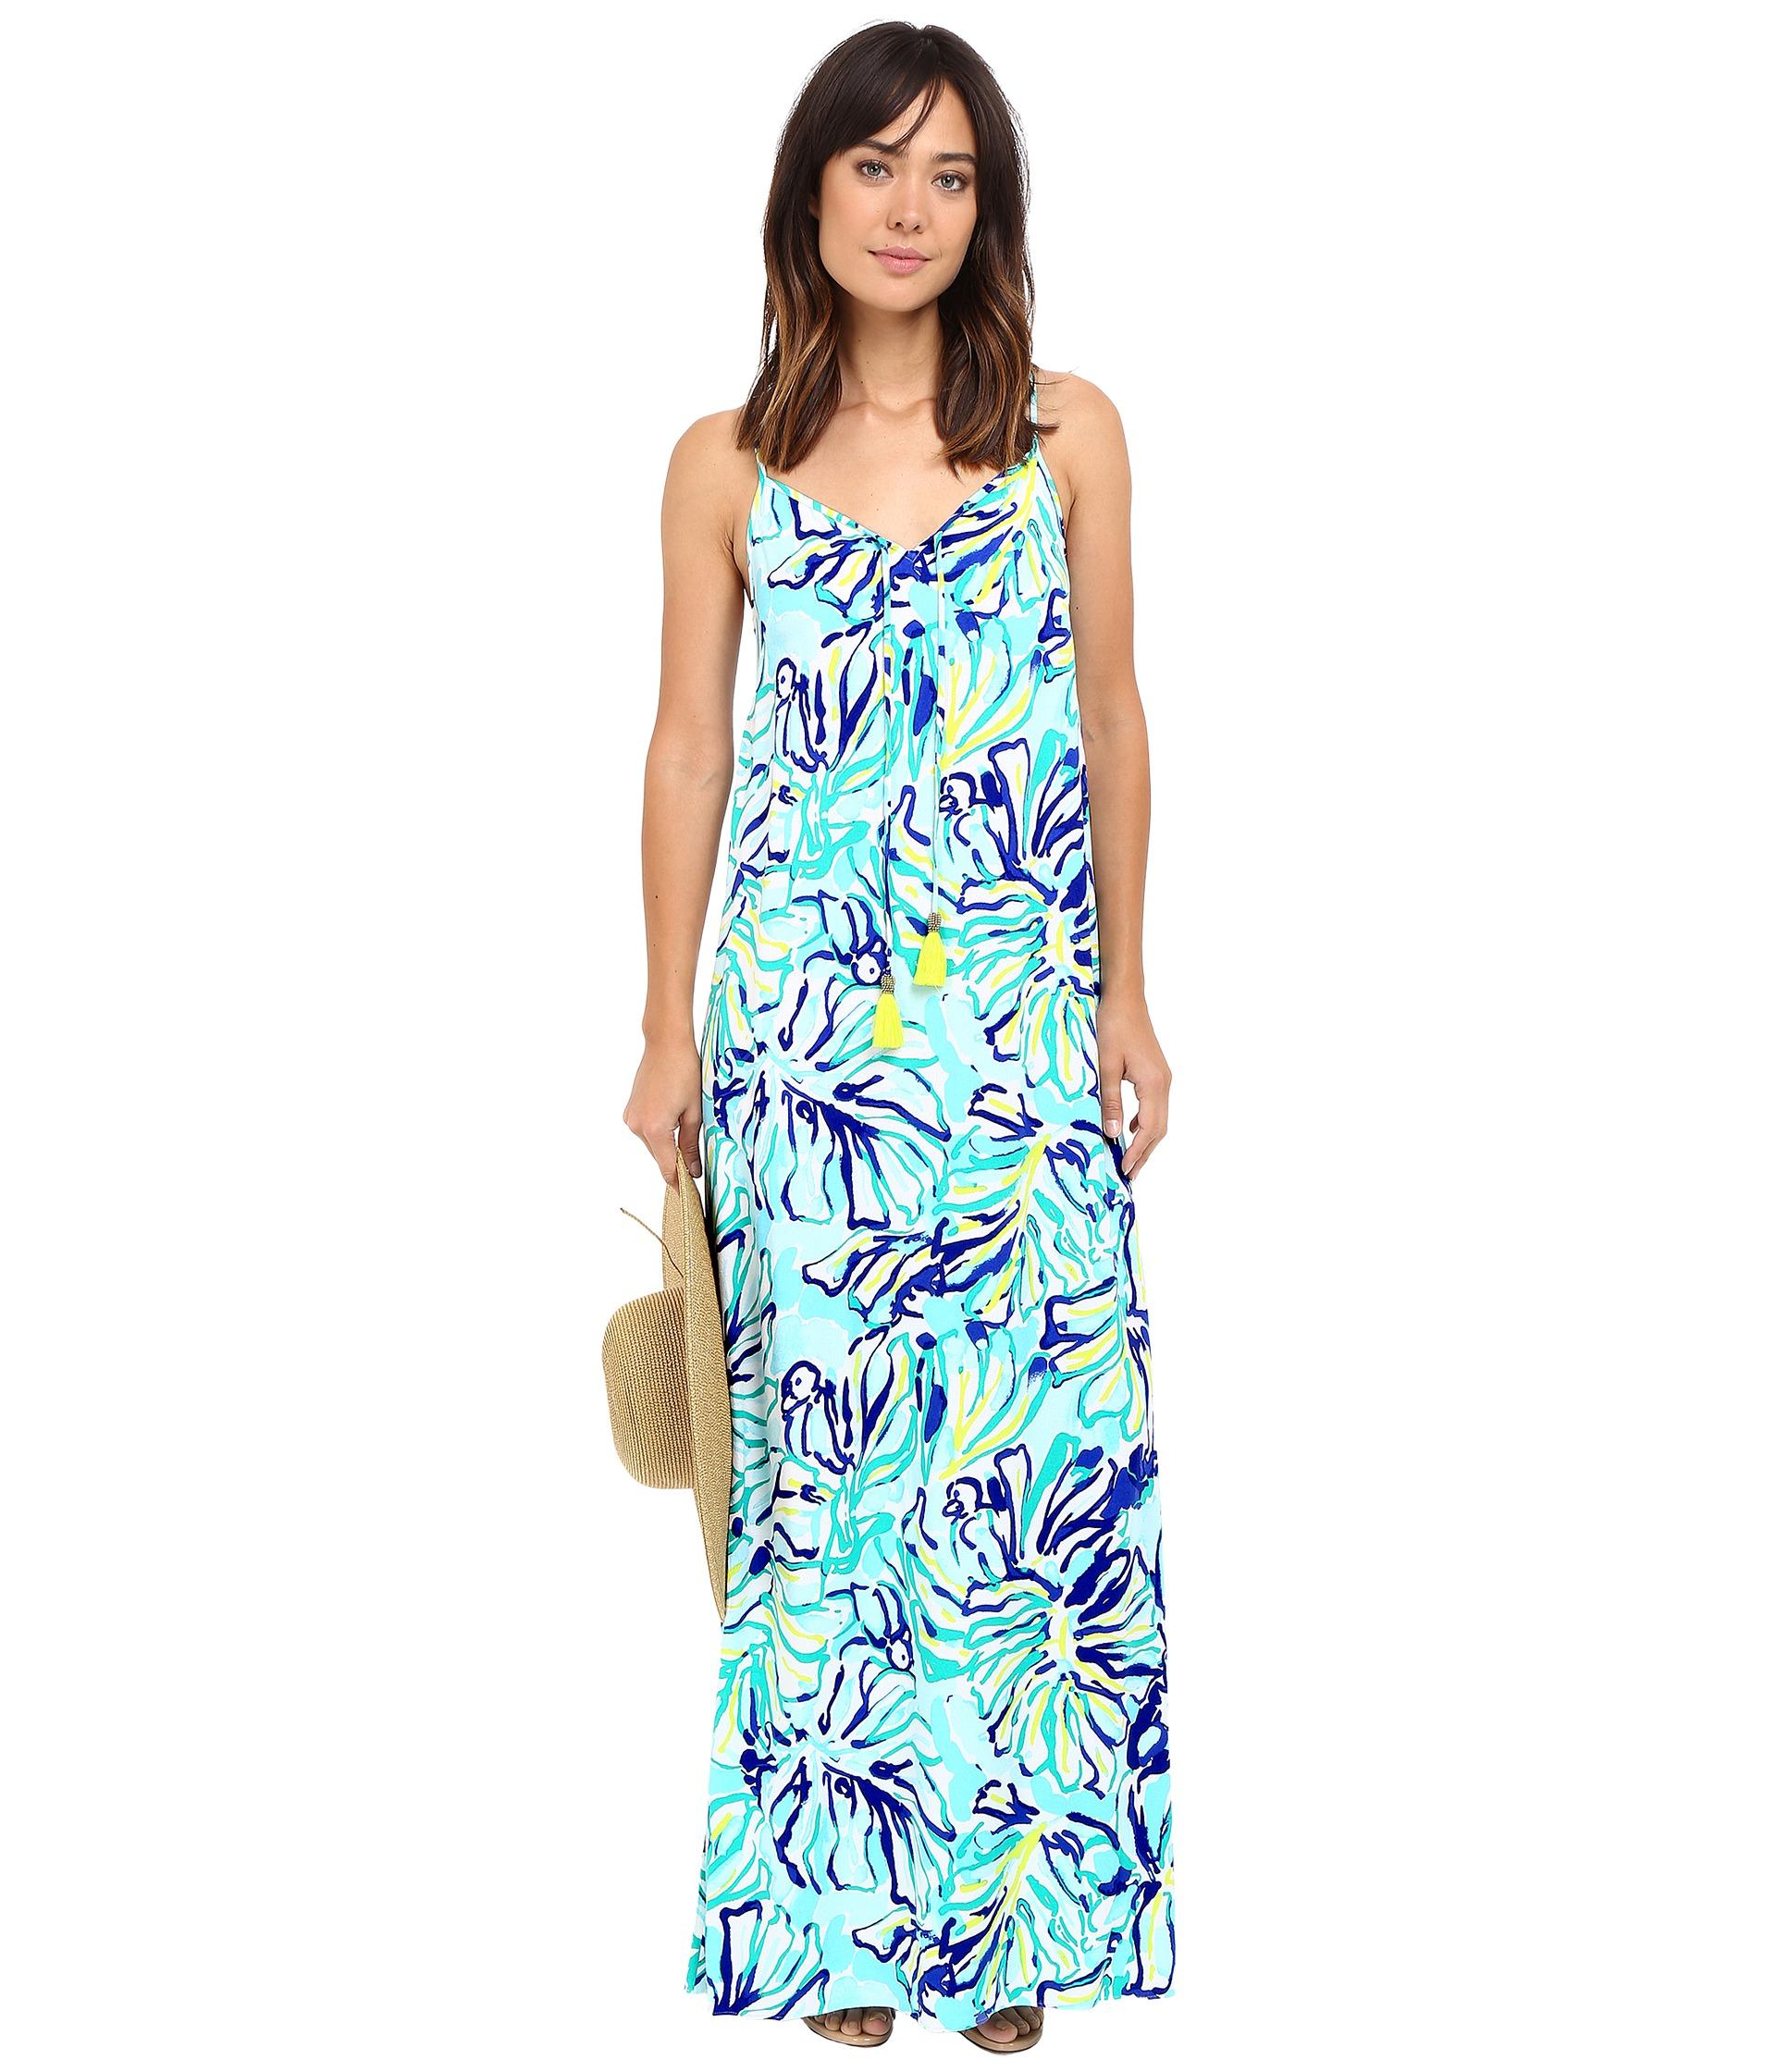 Lilly pulitzer sloane maxi dress - Fashion dresses